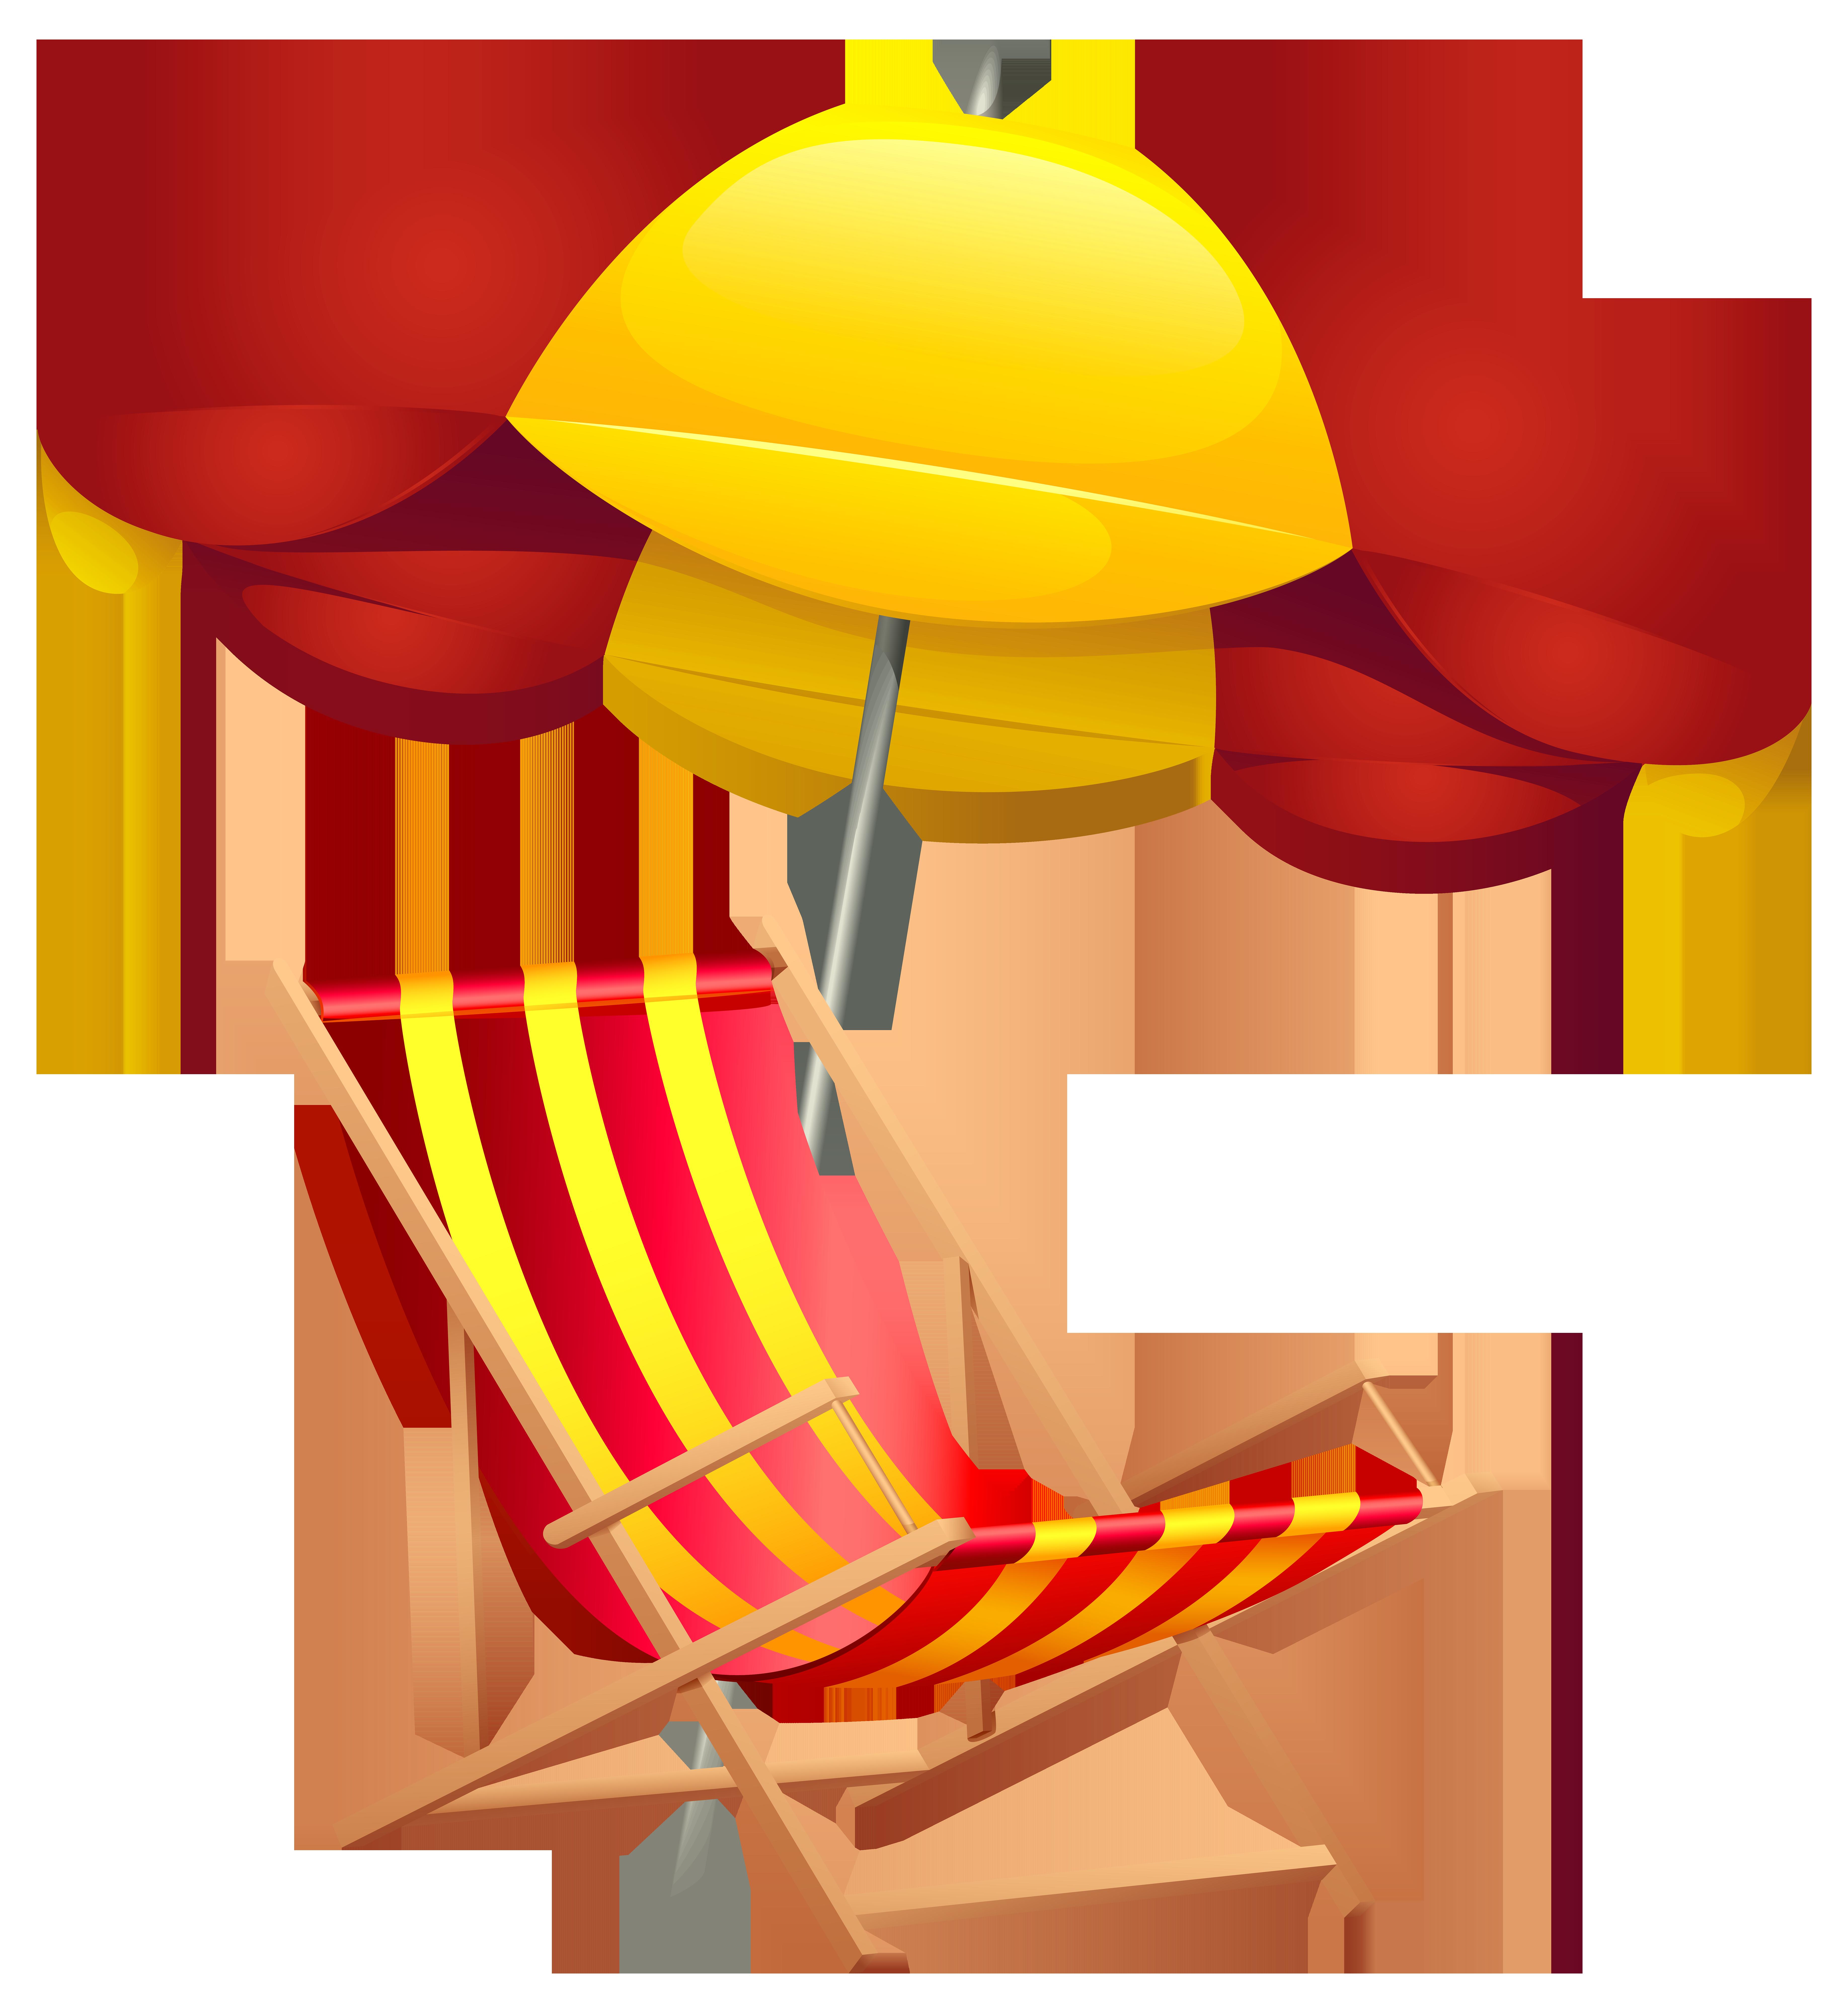 Chair at getdrawings com. Clipart umbrella winter